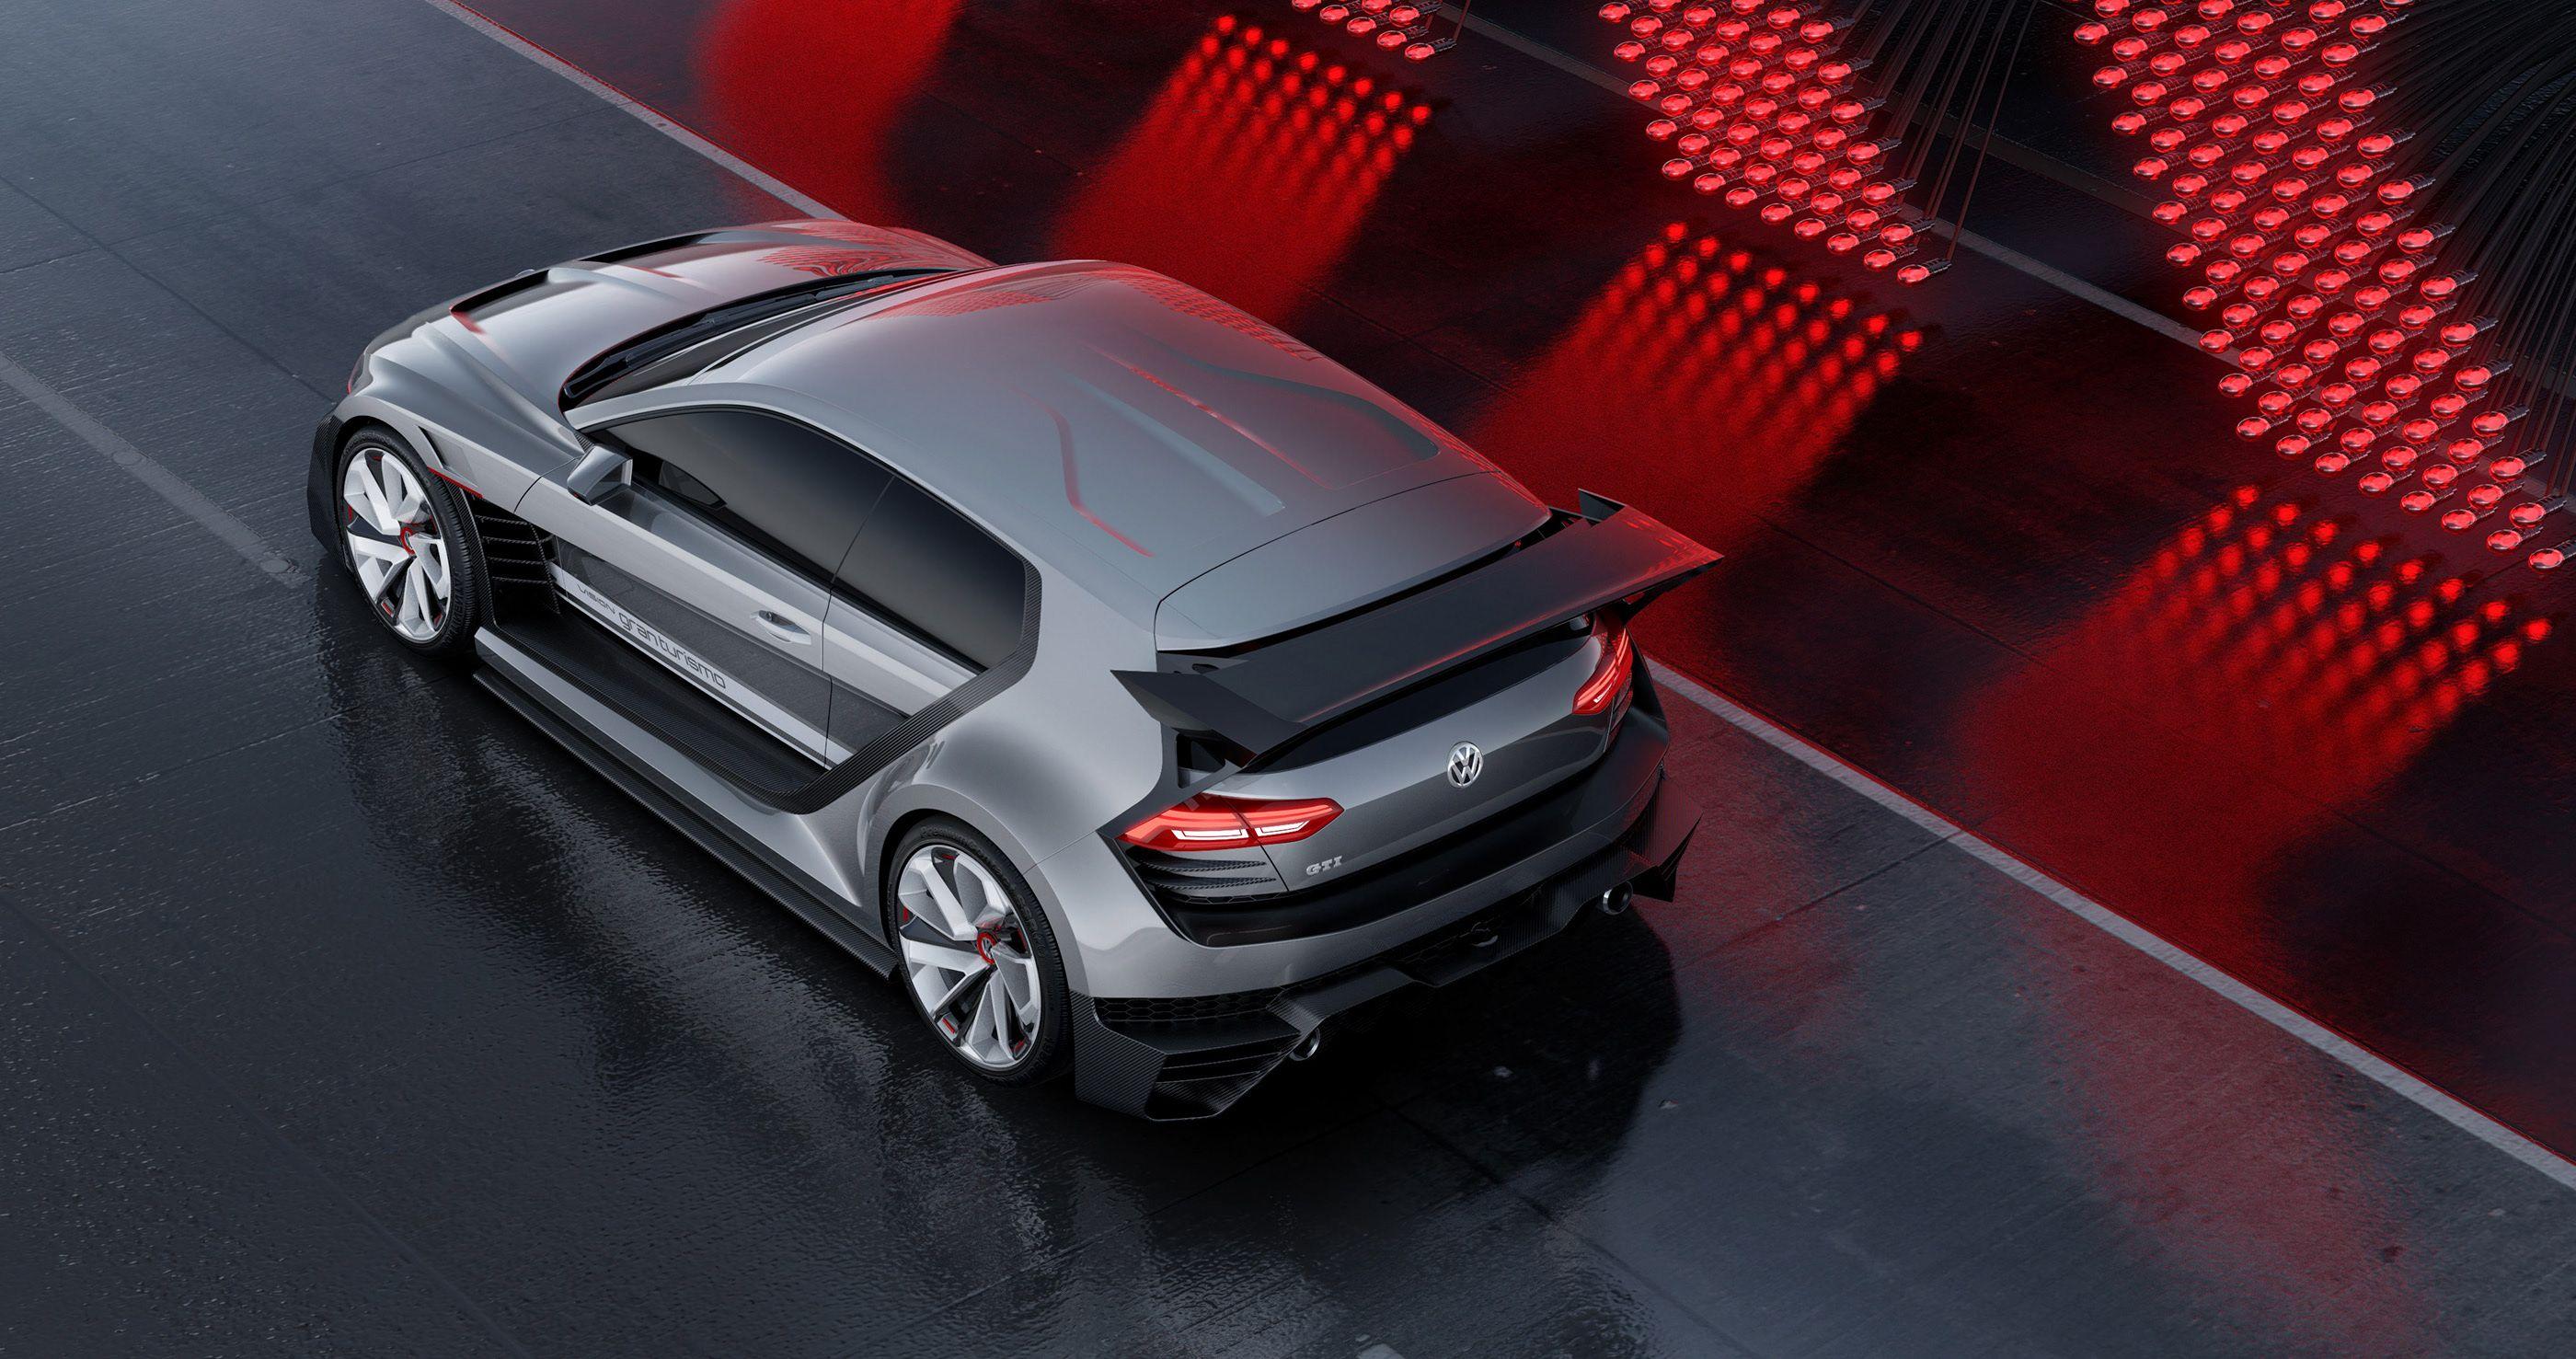 Volkswagen Gti Supersport Vision Gran Turismo Concept On Behance In 2020 Volkswagen Gti Volkswagen Gti